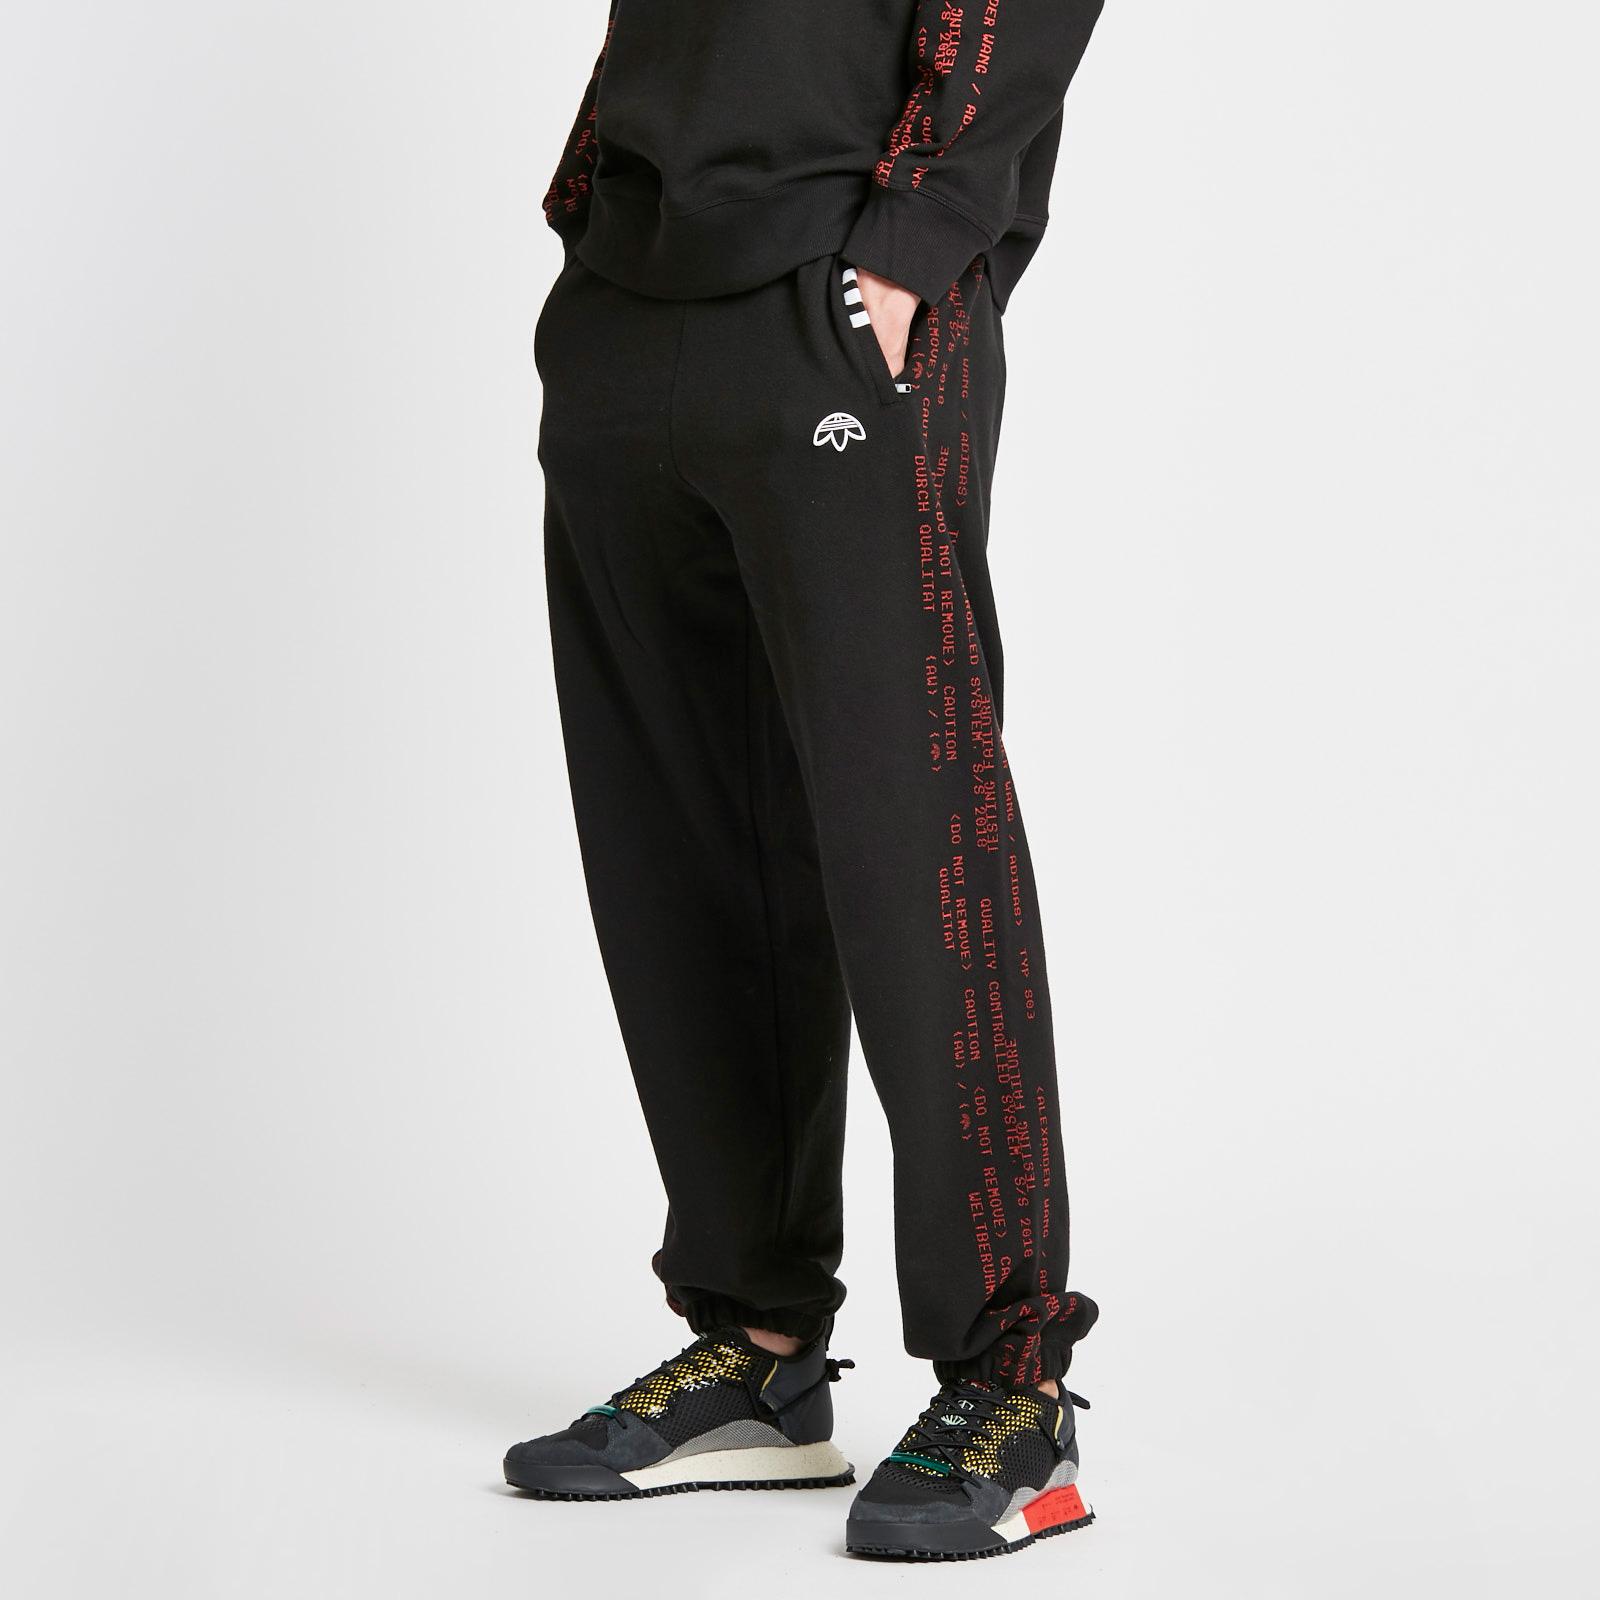 SneakersnstuffSneakers Adidas Dm9689 X Joggers Wang Alexander nOPw8Xk0